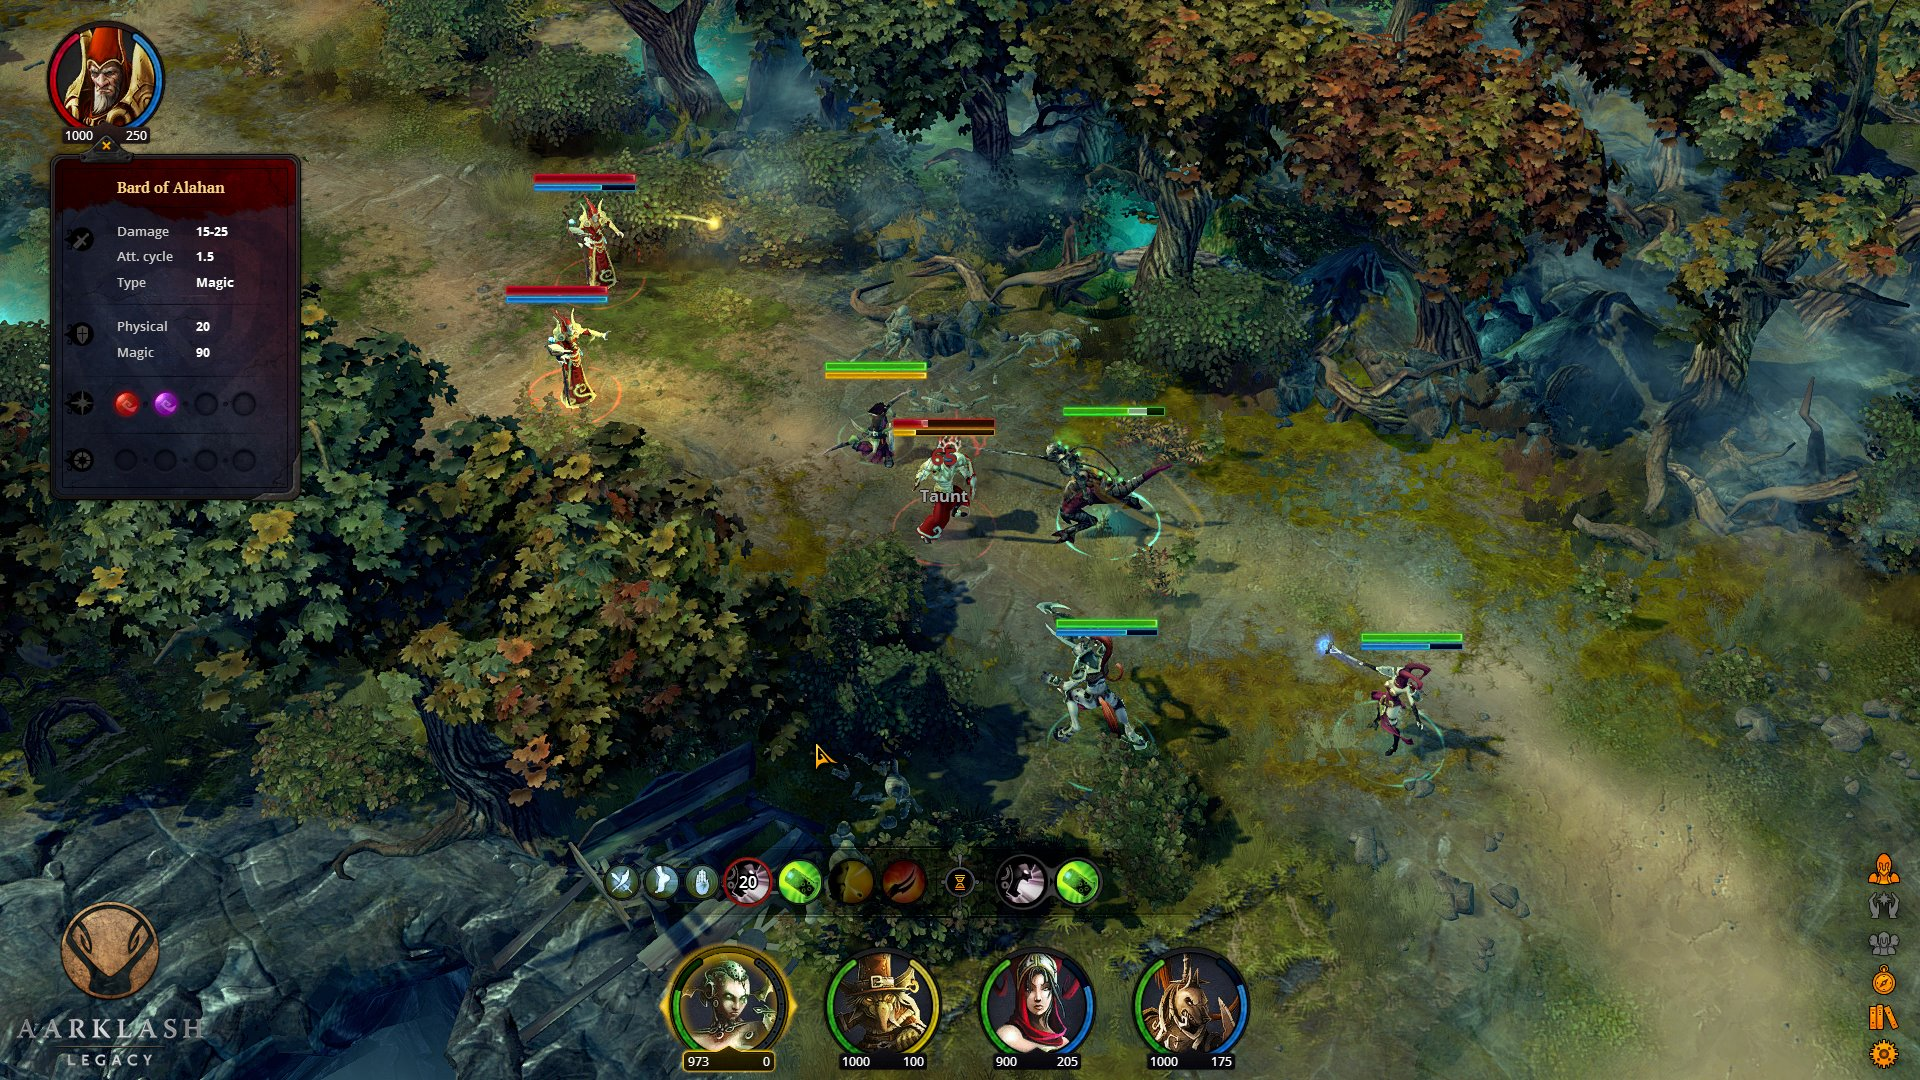 Aarklash: Legacy Backgrounds on Wallpapers Vista